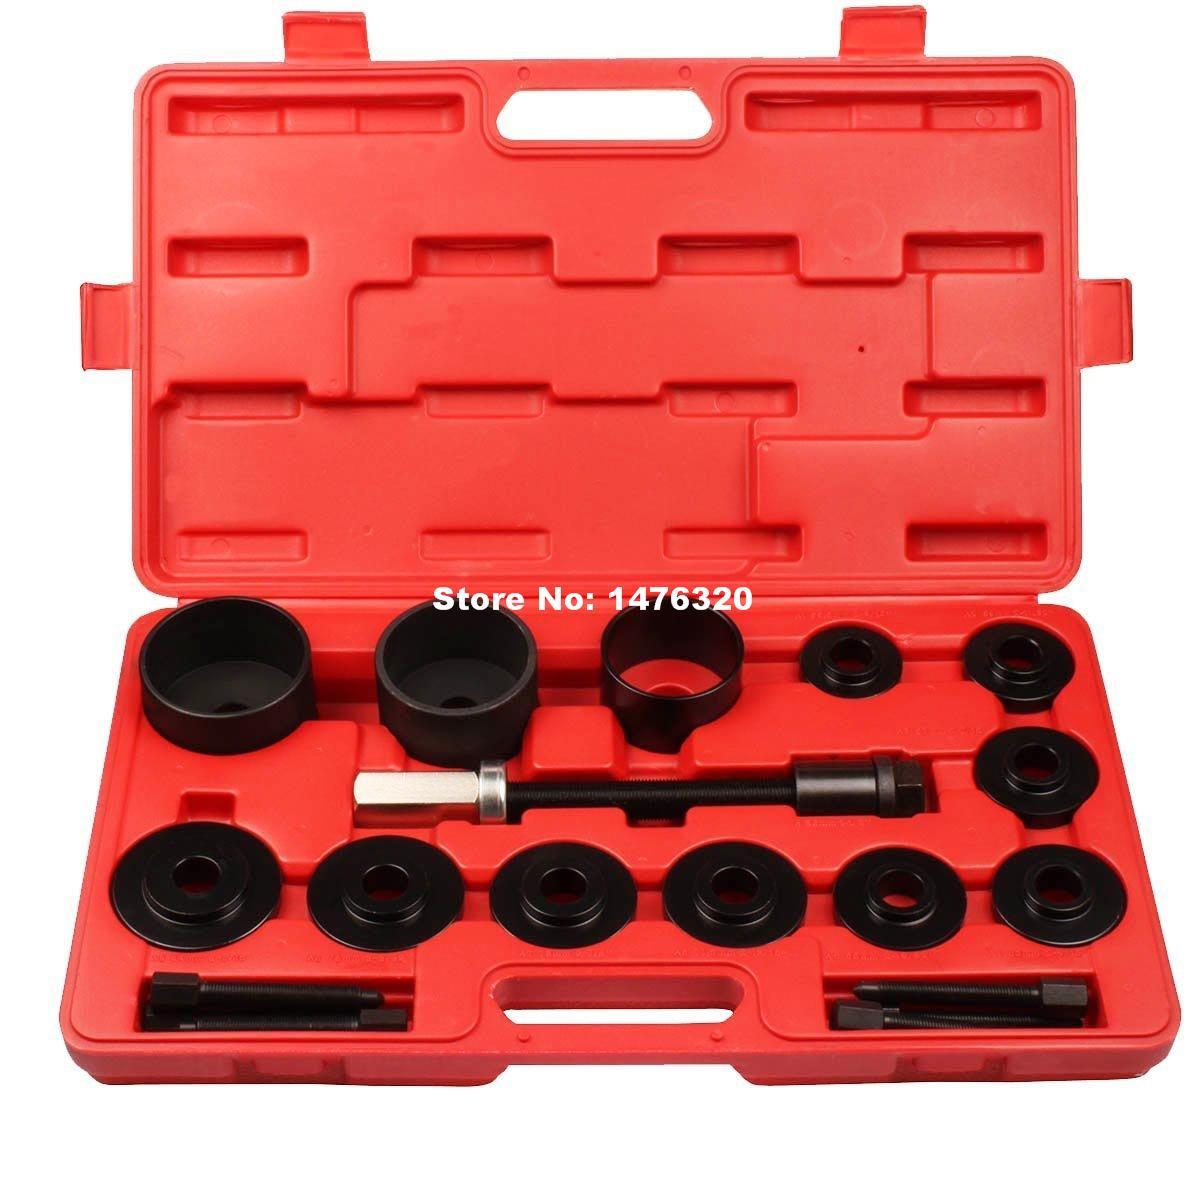 Automotive Wheel Front Hub Bearing Removal Tool Auto Repair Garage Tools 55.5/59/62/65/66/71.5/73/78/84/86/91mm Adaptor AT2012